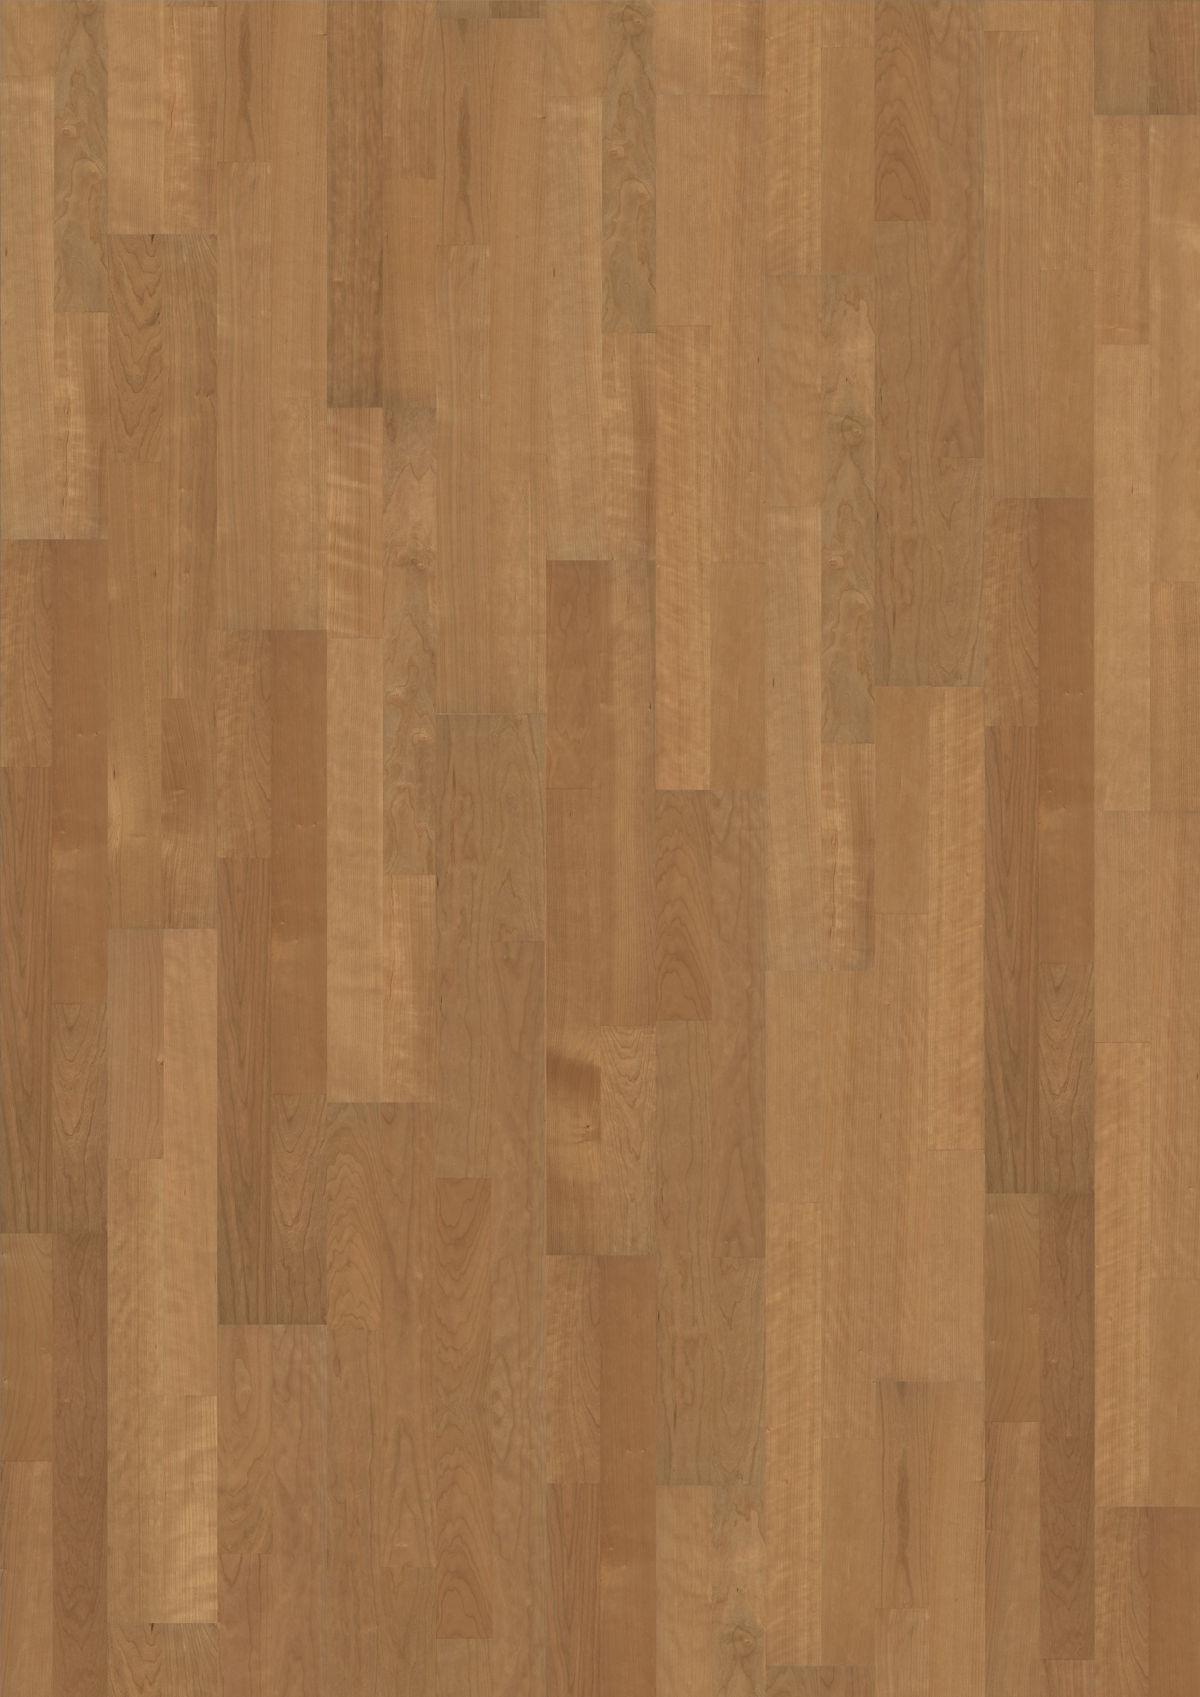 kahrs linnea cherry winter engineered wood flooring. Black Bedroom Furniture Sets. Home Design Ideas